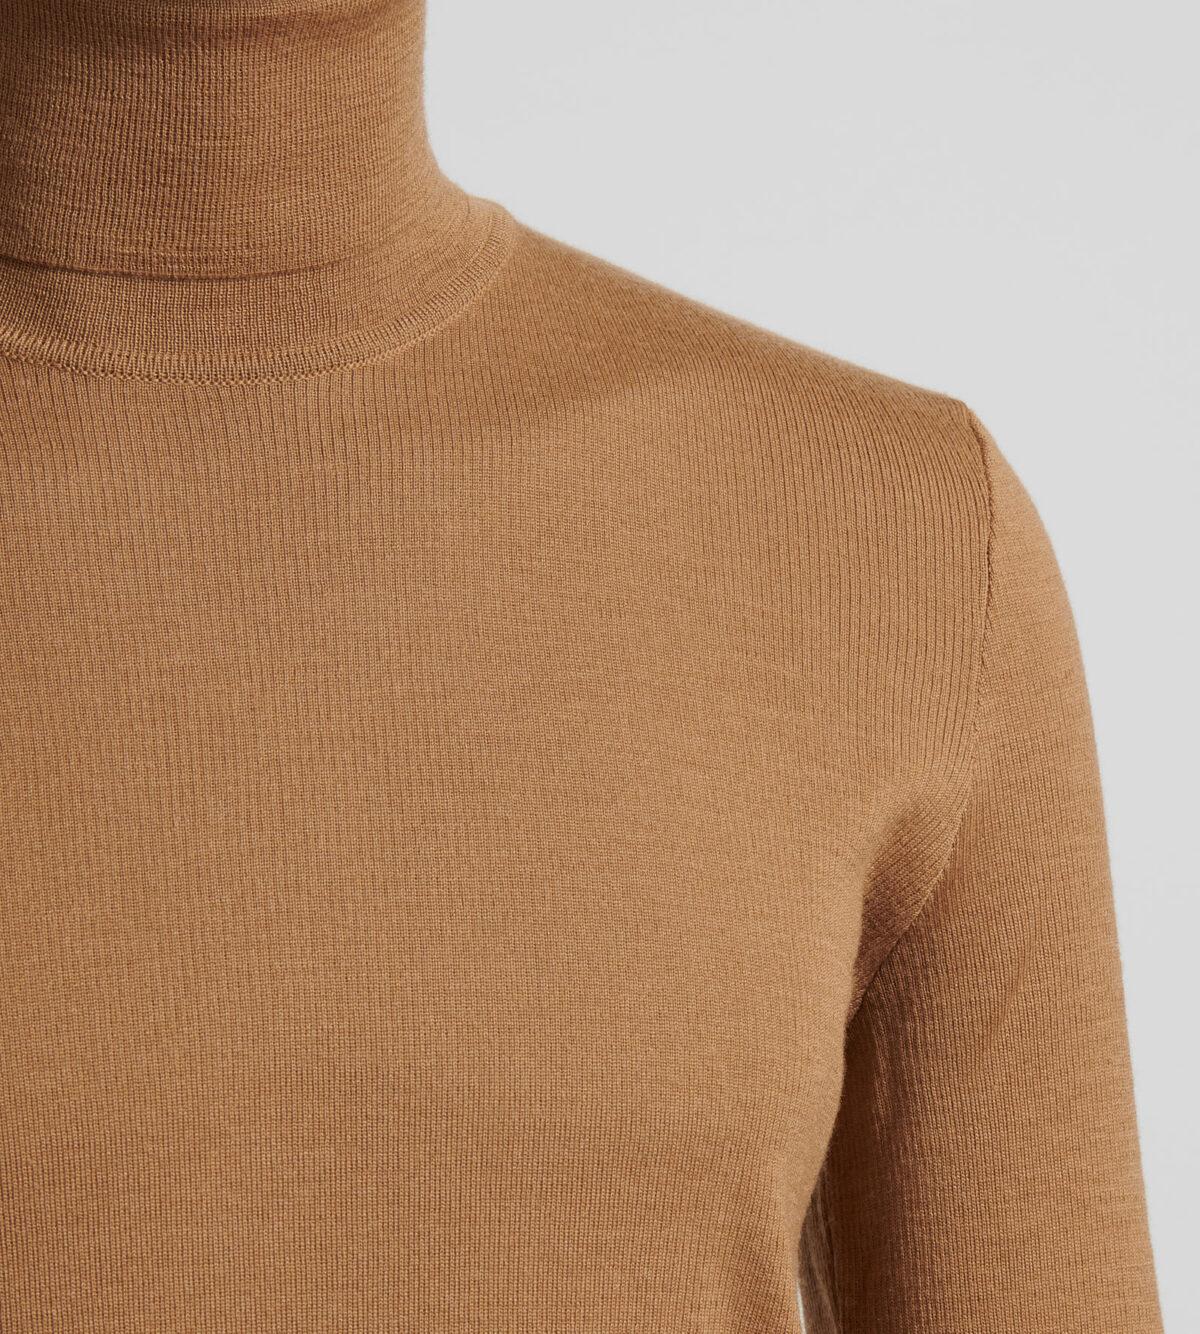 digel-bezs-slim-fit-garbo-nyaku-gyapju-kevert-pulover-assani1-1-1278012-74